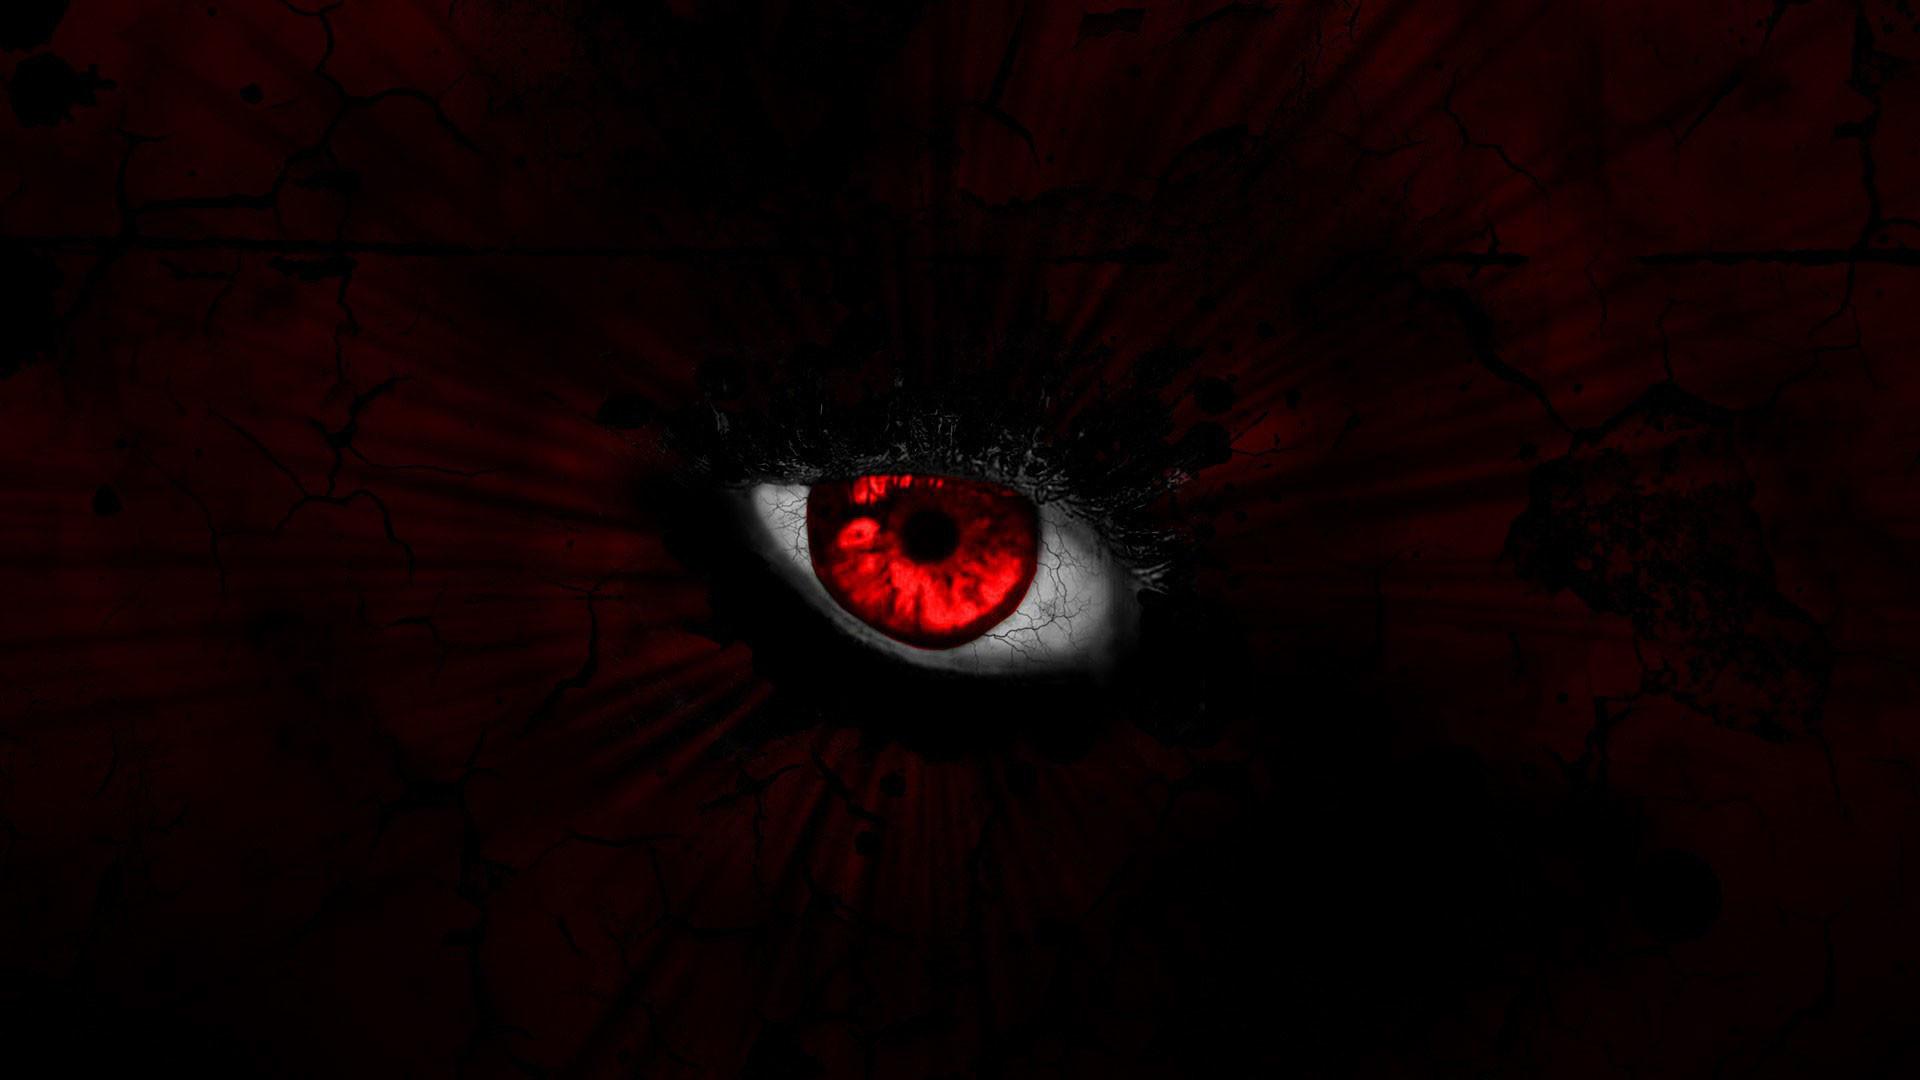 Red Eye Wallpaper (62+ images)